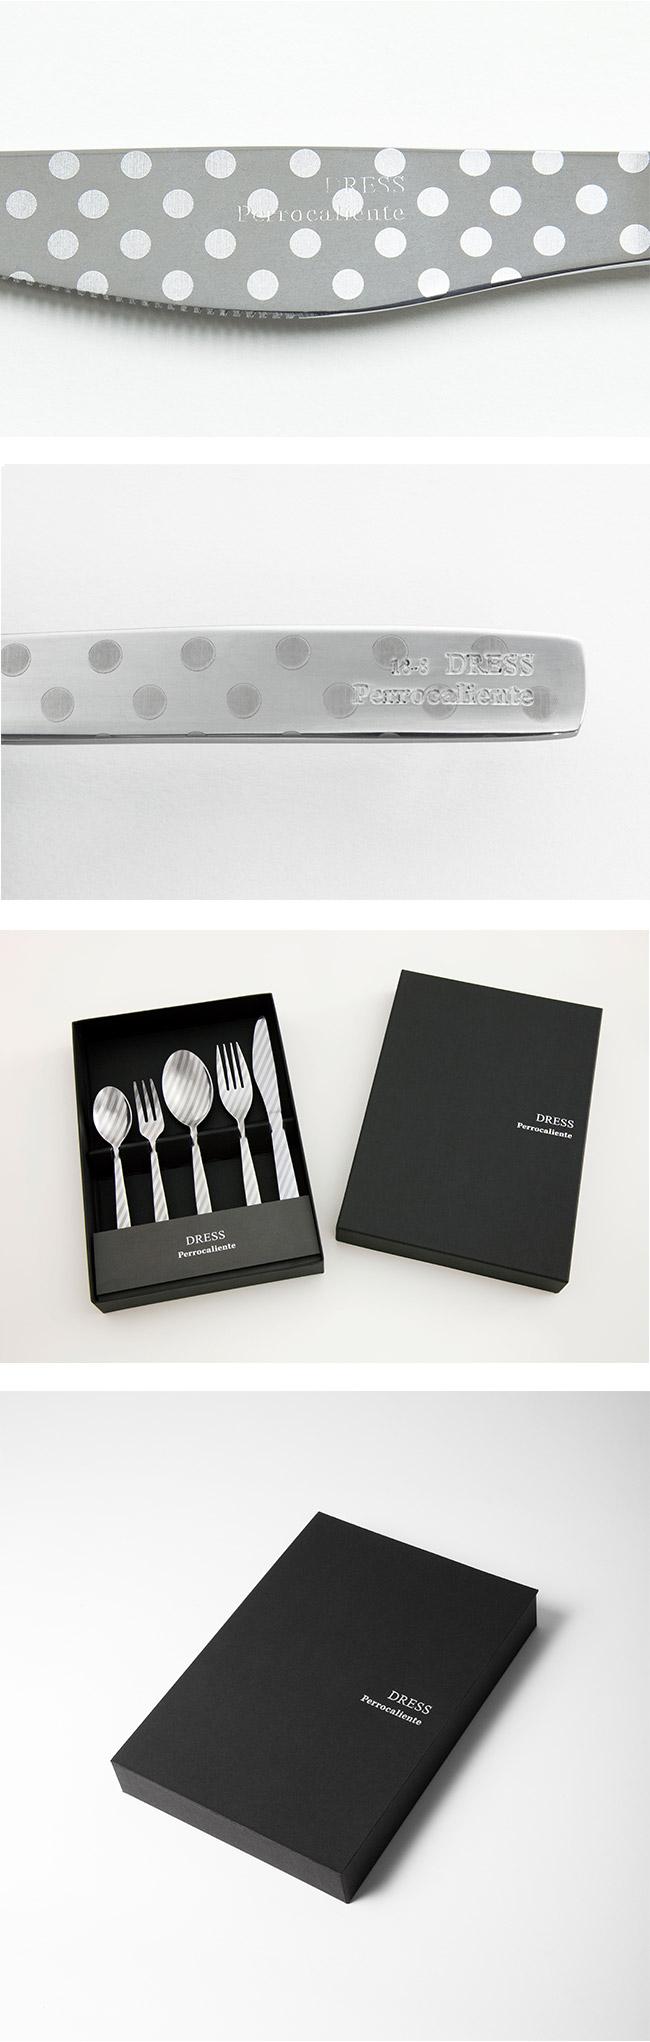 Perrocaliente Dress Gift Set 銀色盒裝餐具組 晚餐組 波卡圓點 (湯匙+叉子+餐刀)